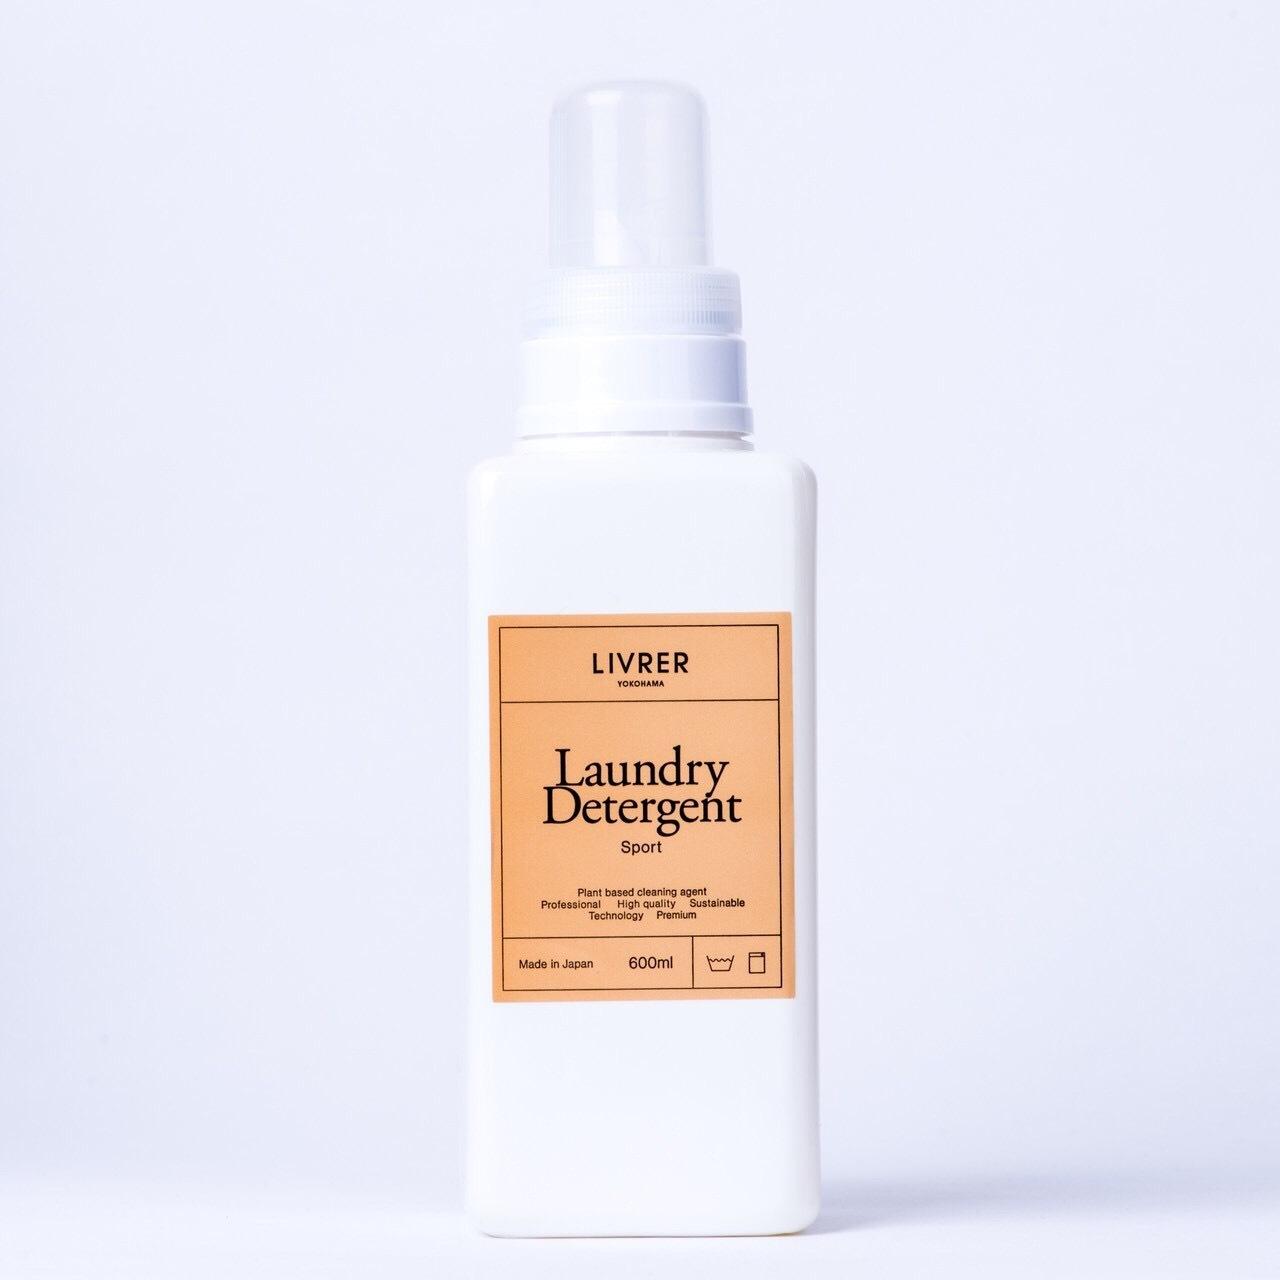 スポーツ/綿、麻、合成繊維用 洗濯用洗剤▶︎ Laundry Detergent Sport 600mL